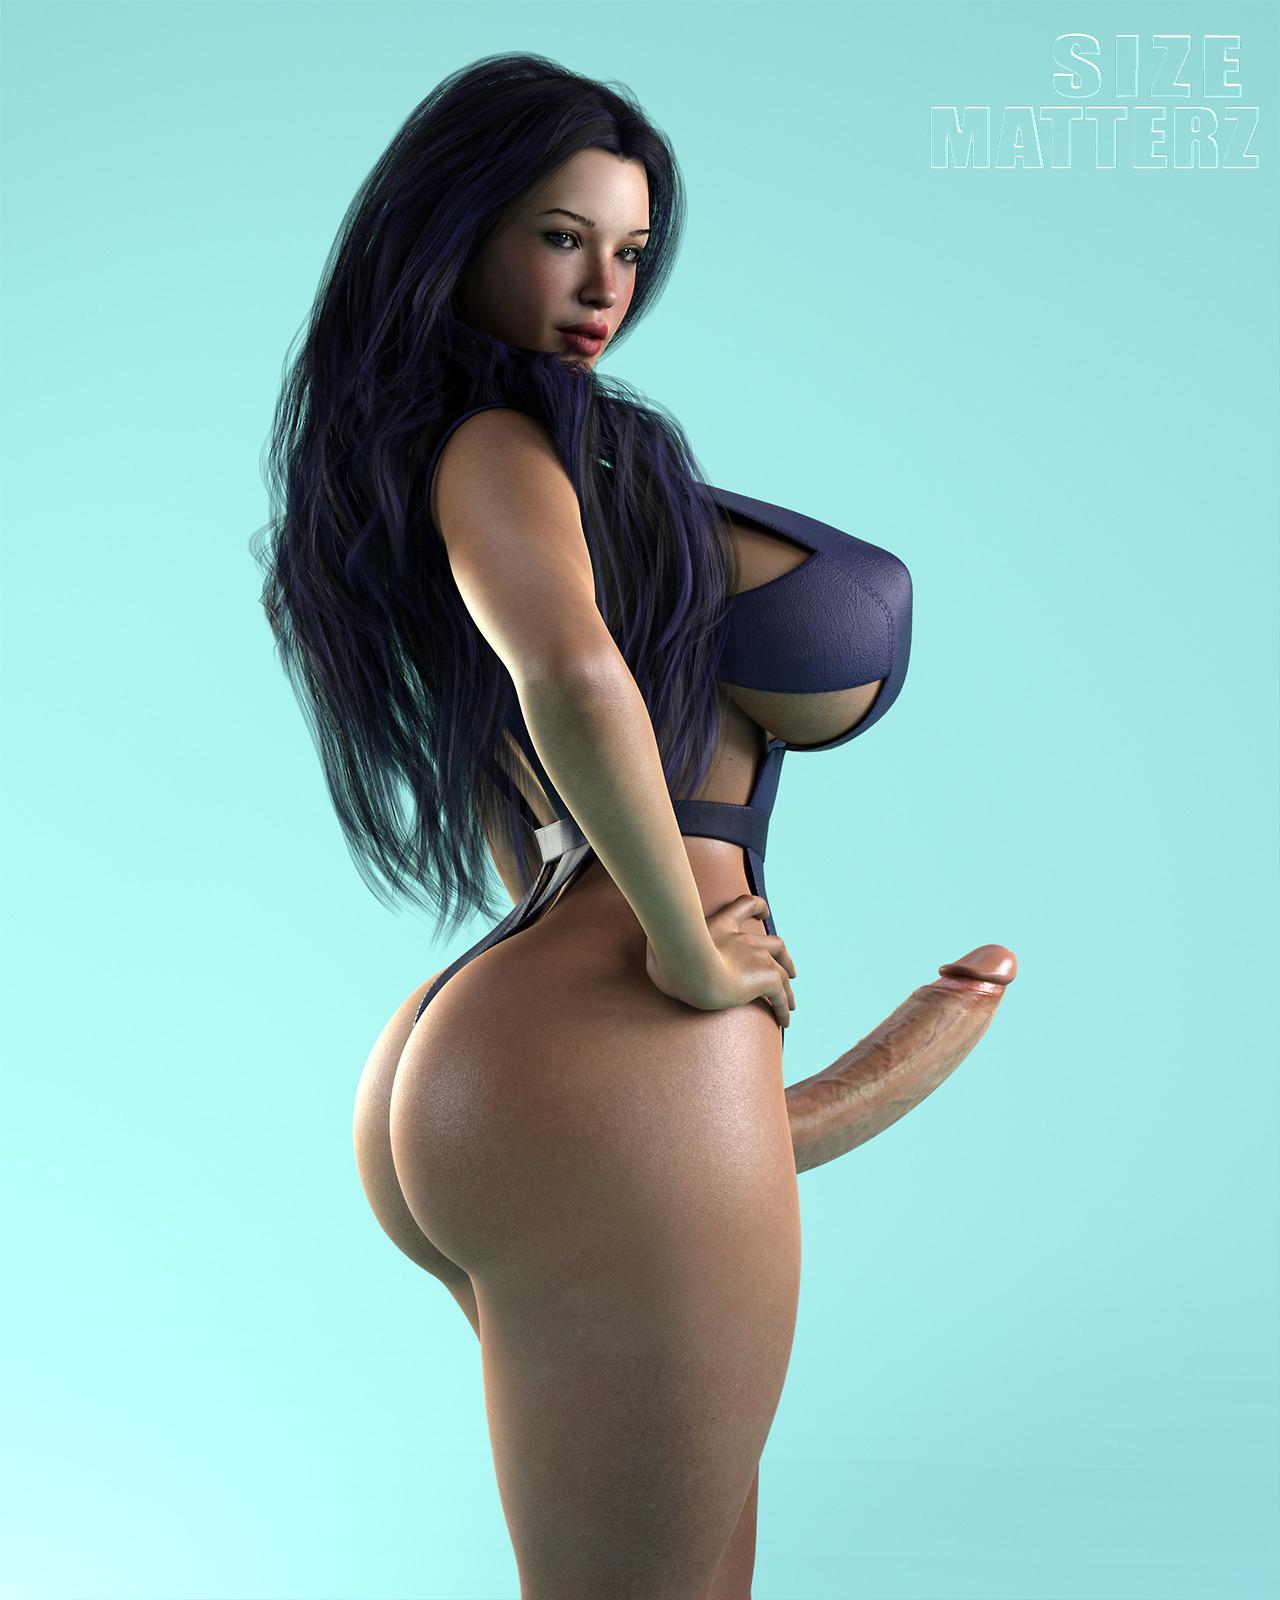 tumblr naked 69